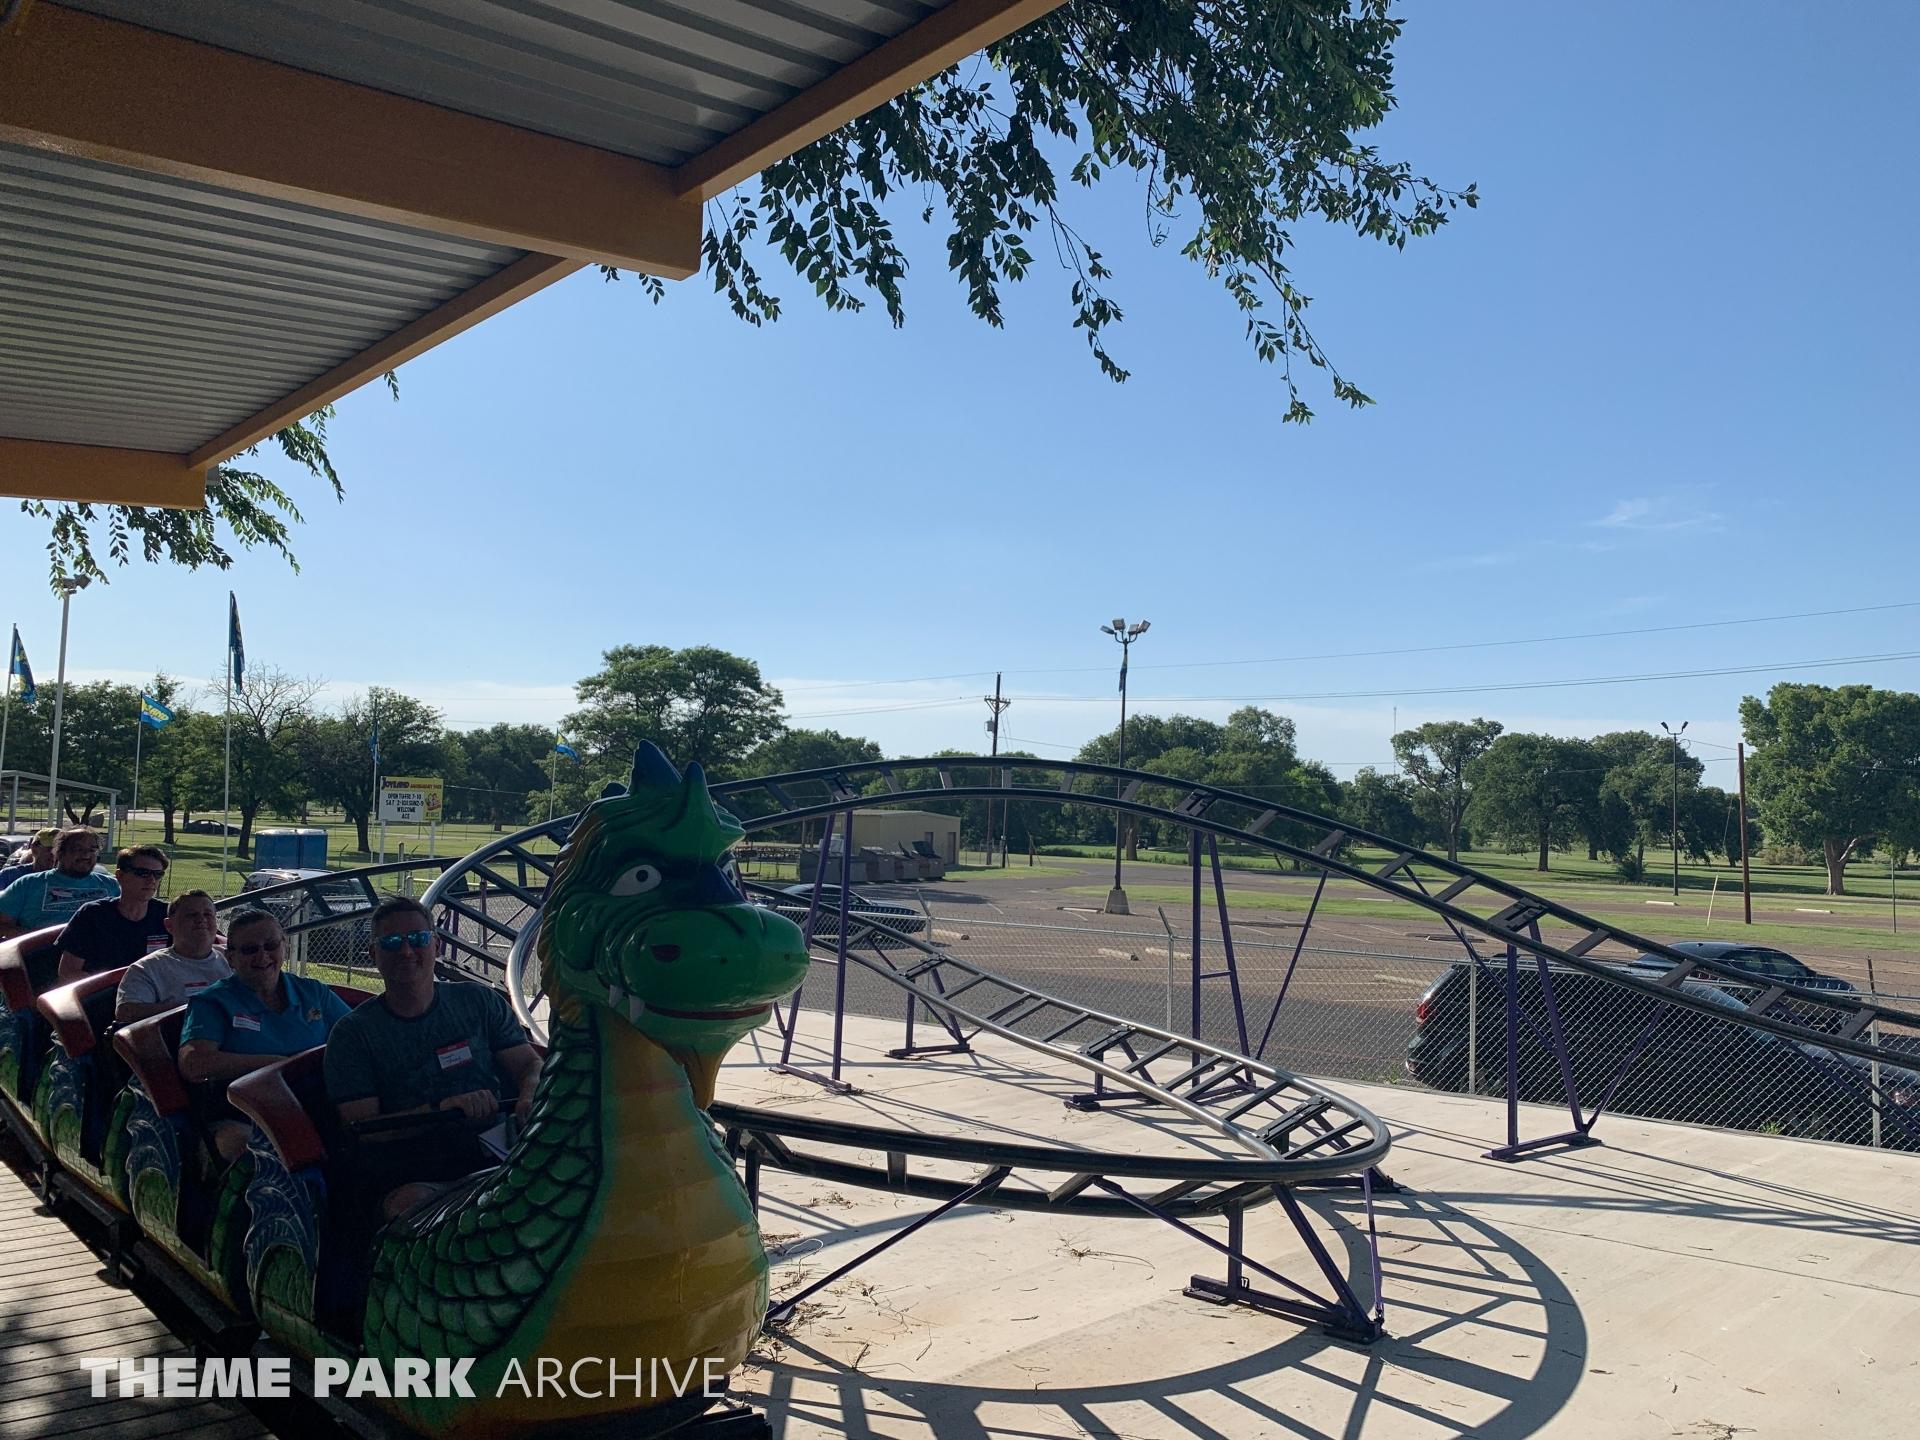 Dragon Coaster at Joyland Amusement Park